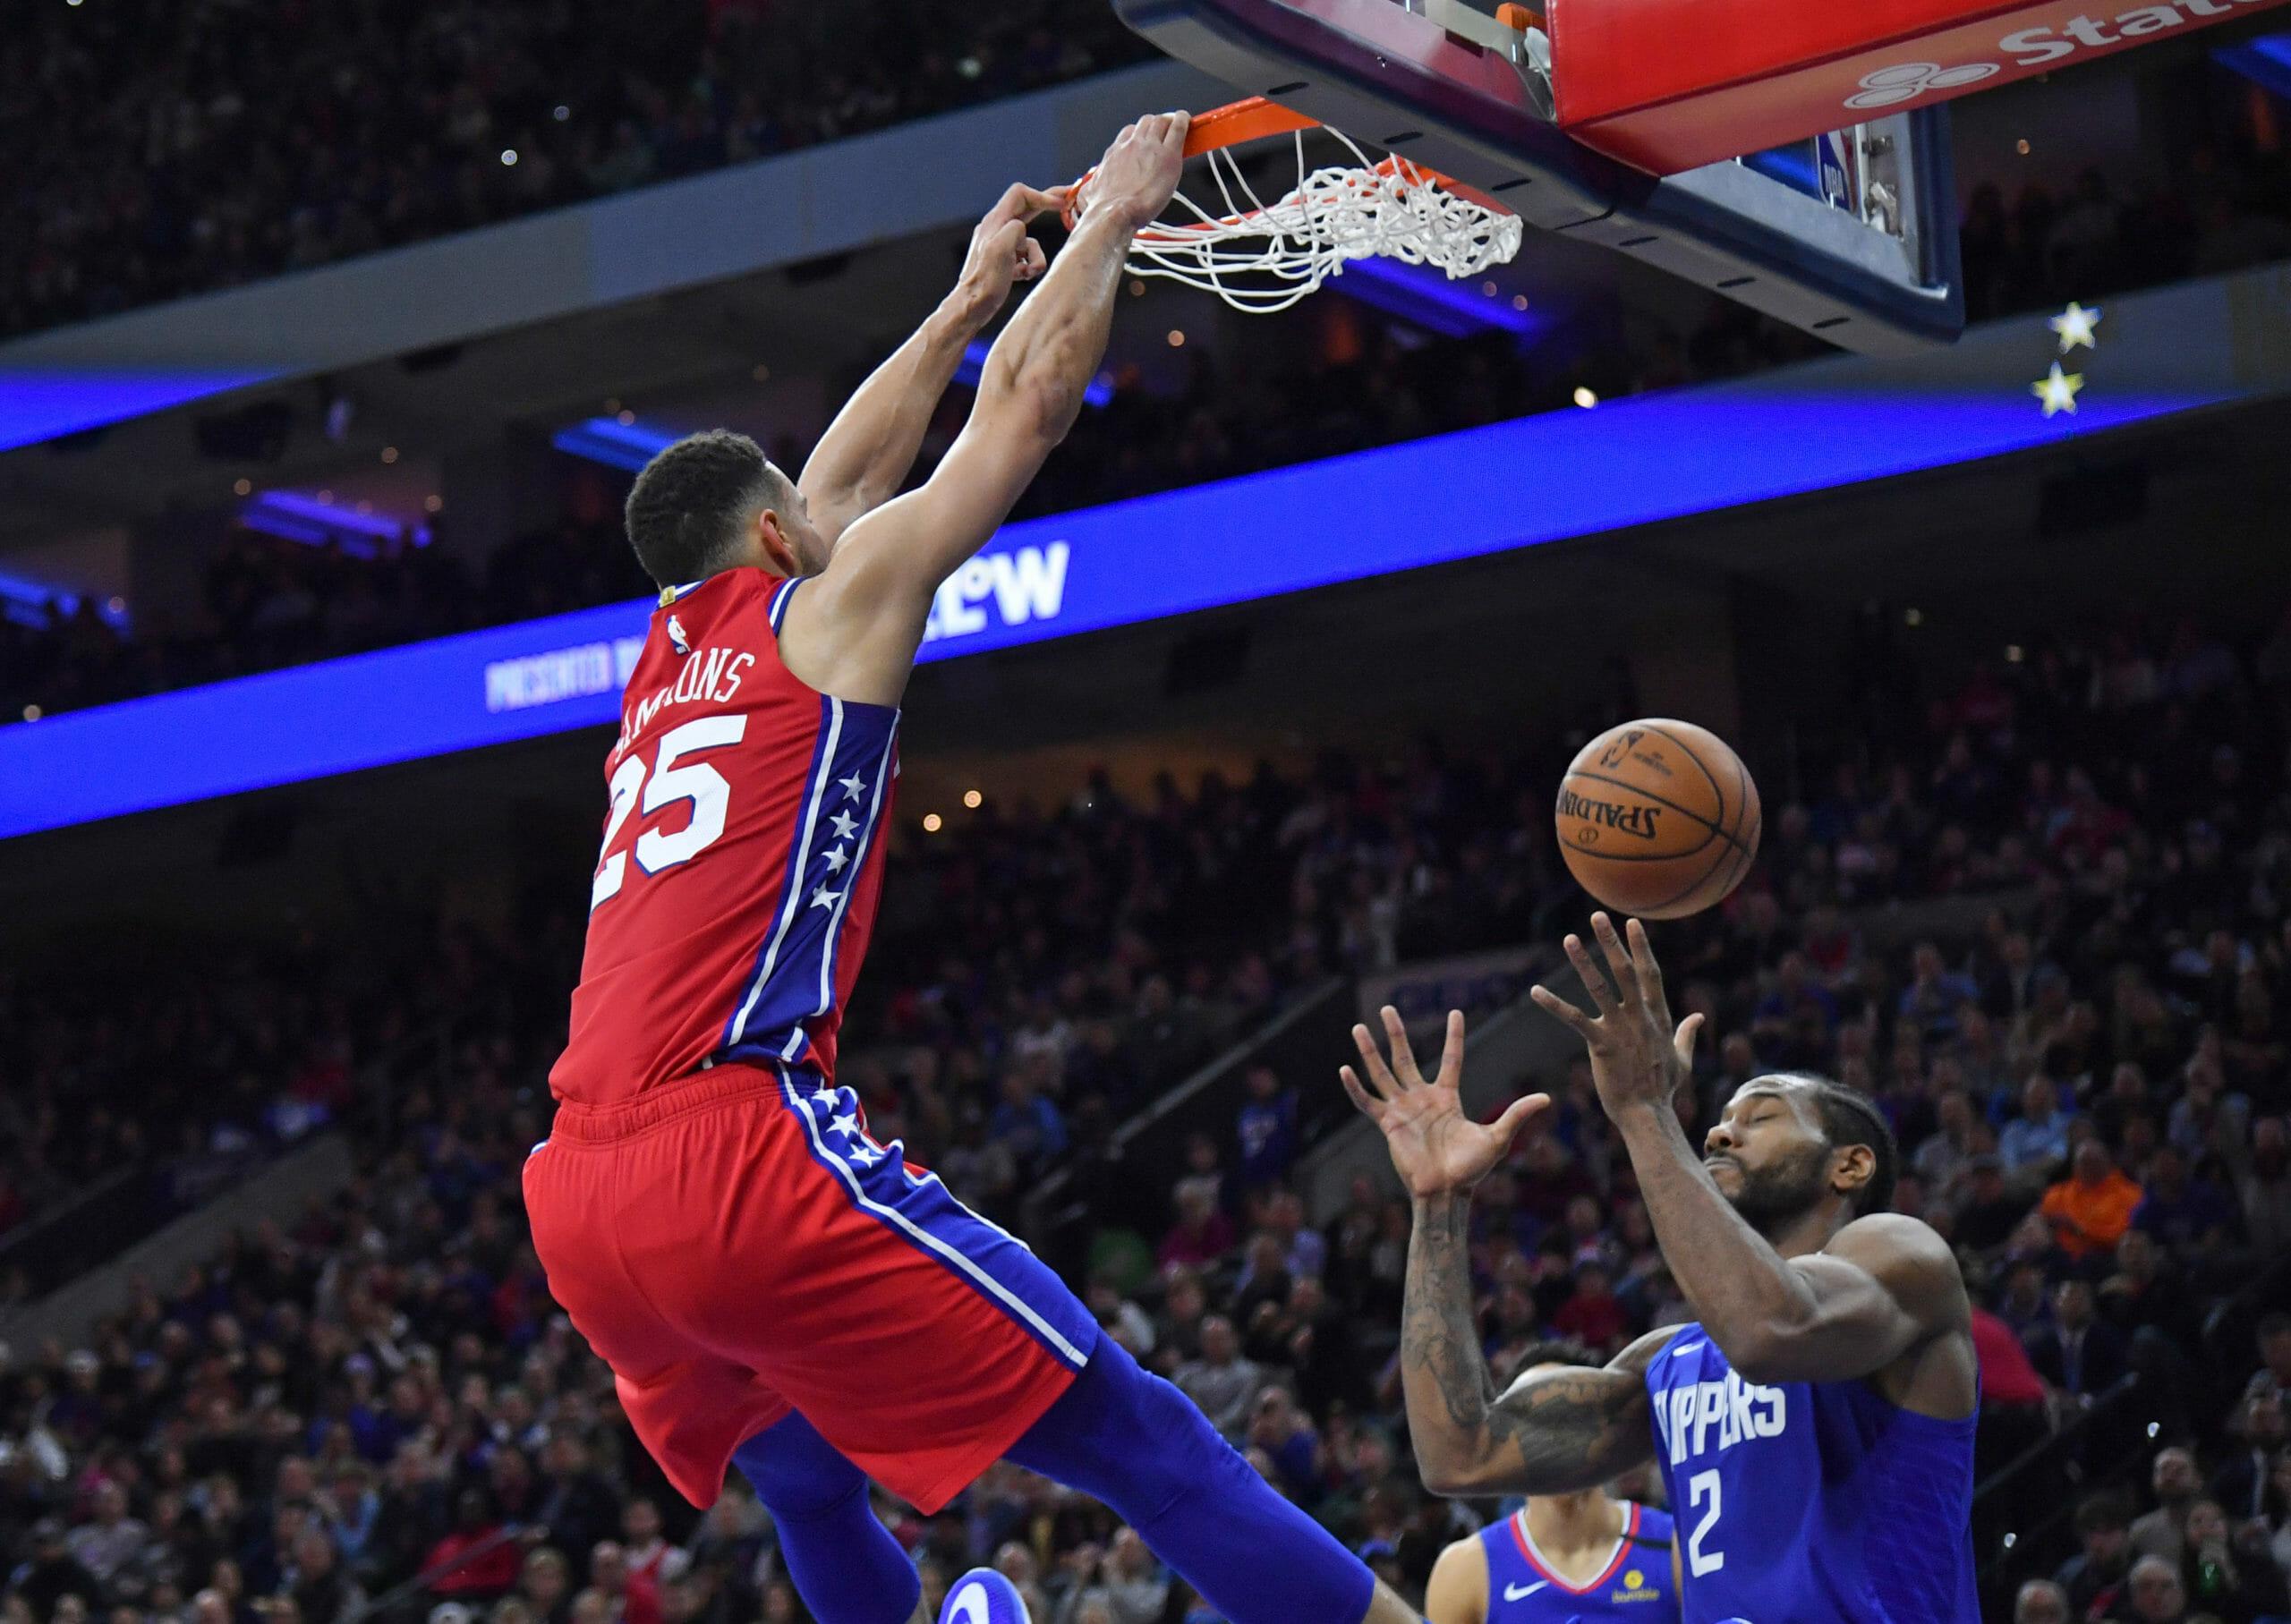 NBA: Οριστικά πρώτοι στην Ανατολή οι Σίξερς – Οι Ρόκετς «έμπλεξαν» τους Κλίπερς